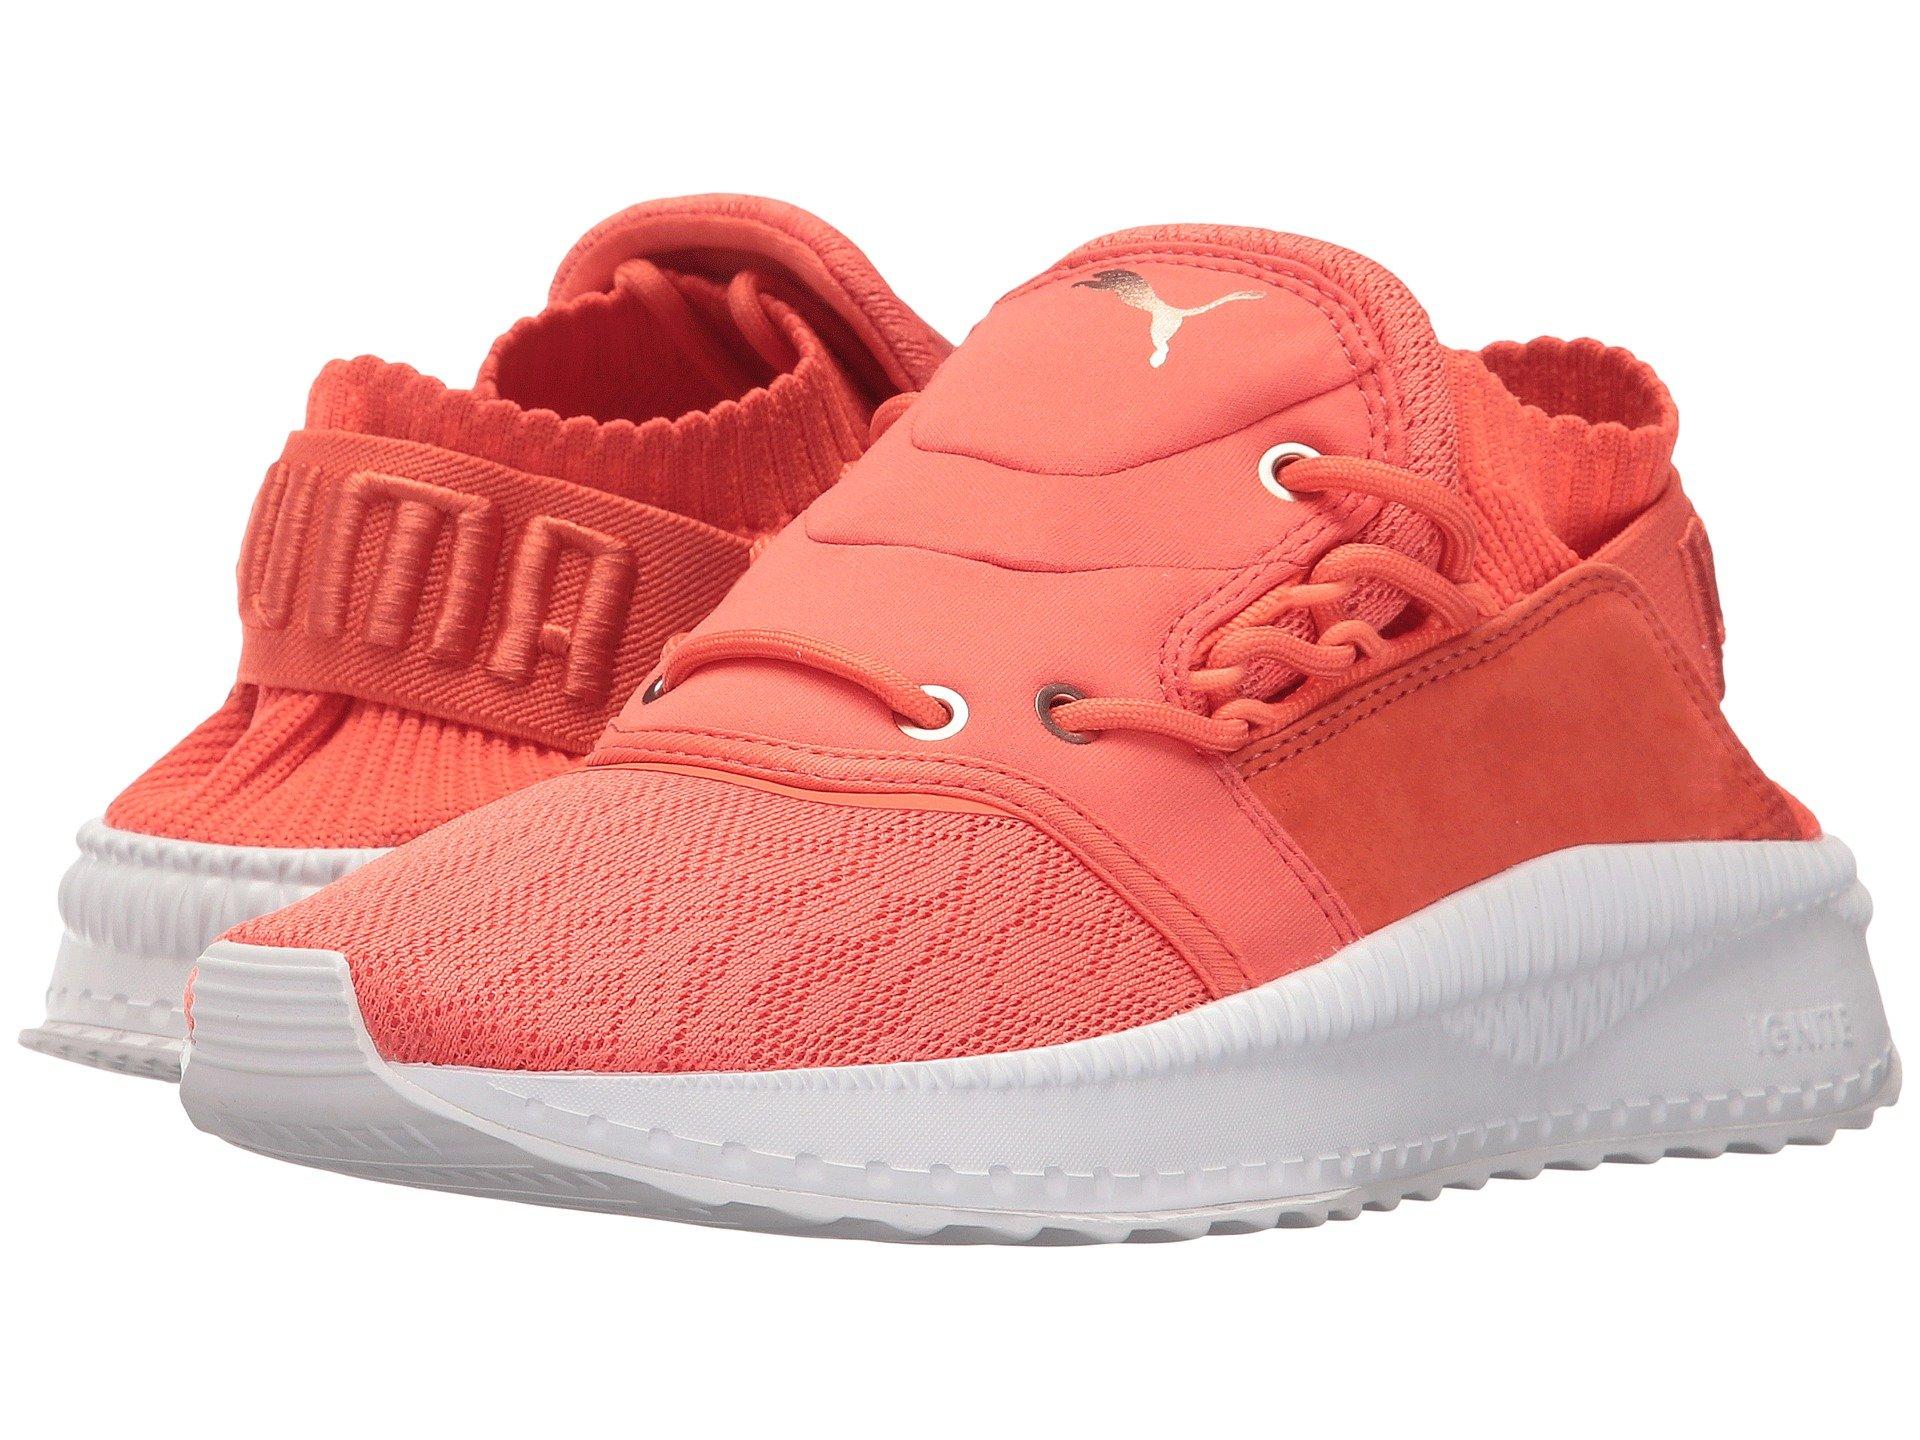 b76e6810c78 Women  . PUMA  . Shoes. First seen in Dec 2017. Puma Tsugi Shinsei